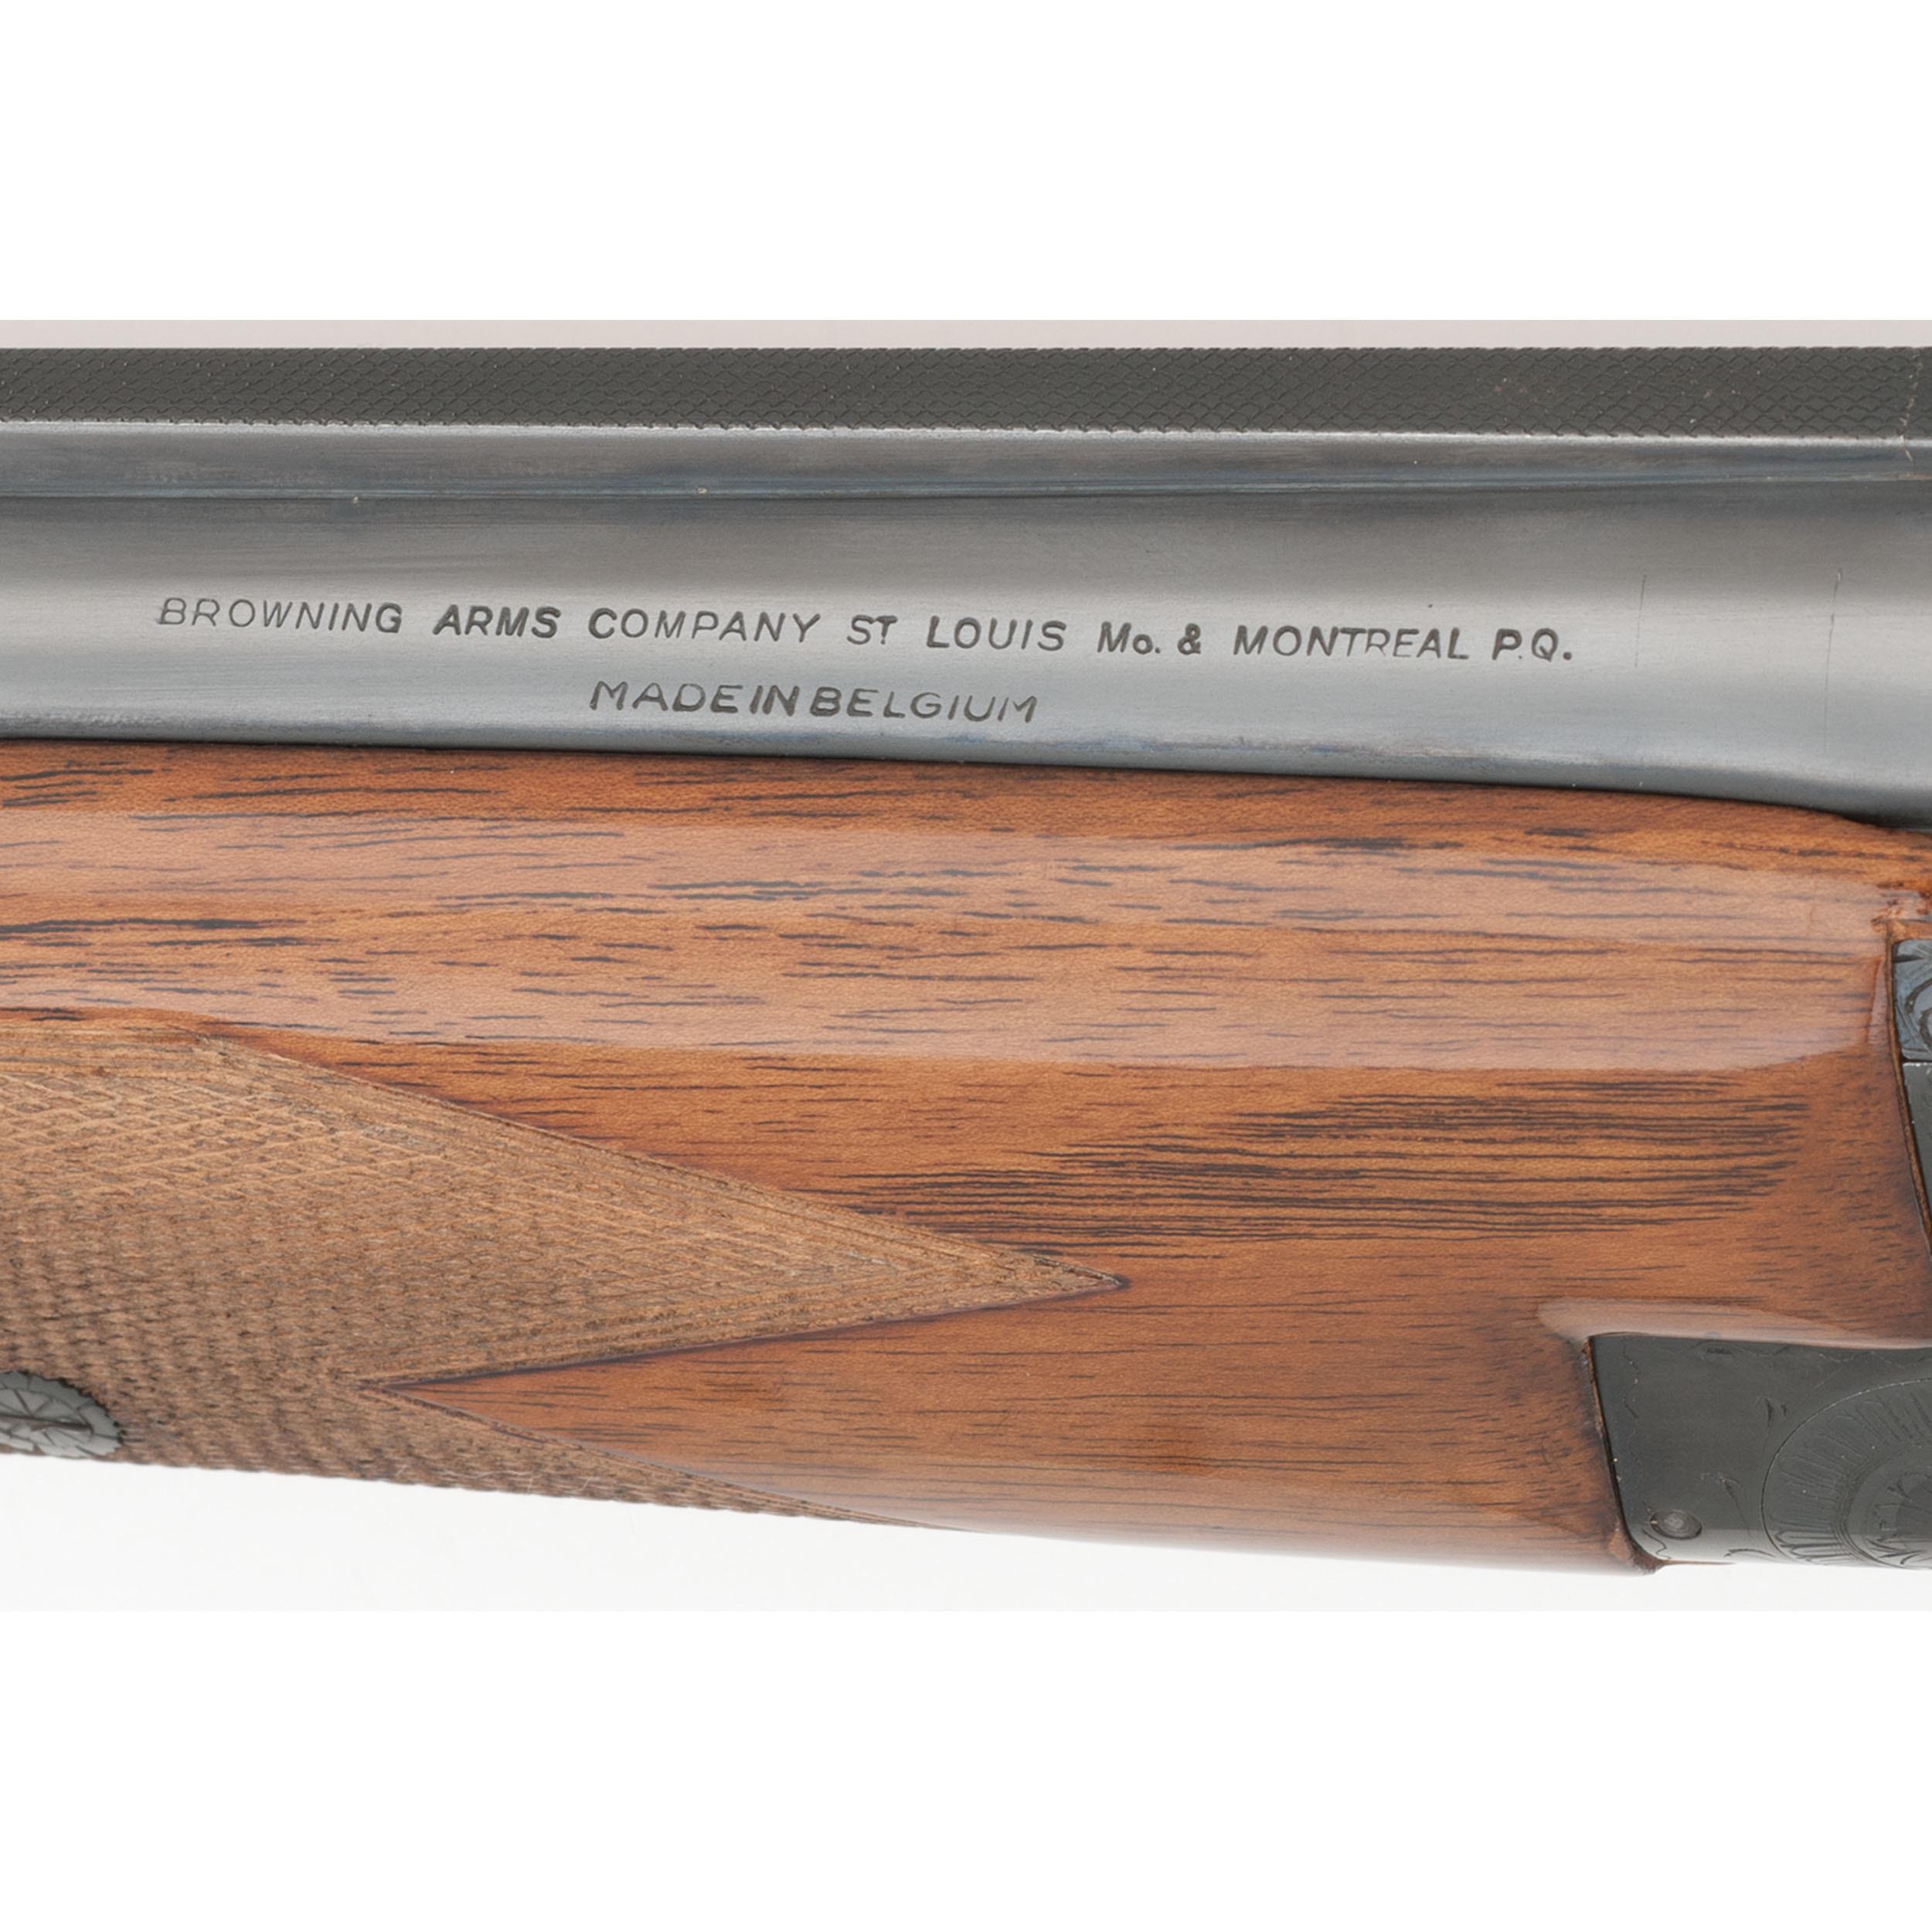 Belgian Browning Superposed Over/Under Shotgun   Cowan's